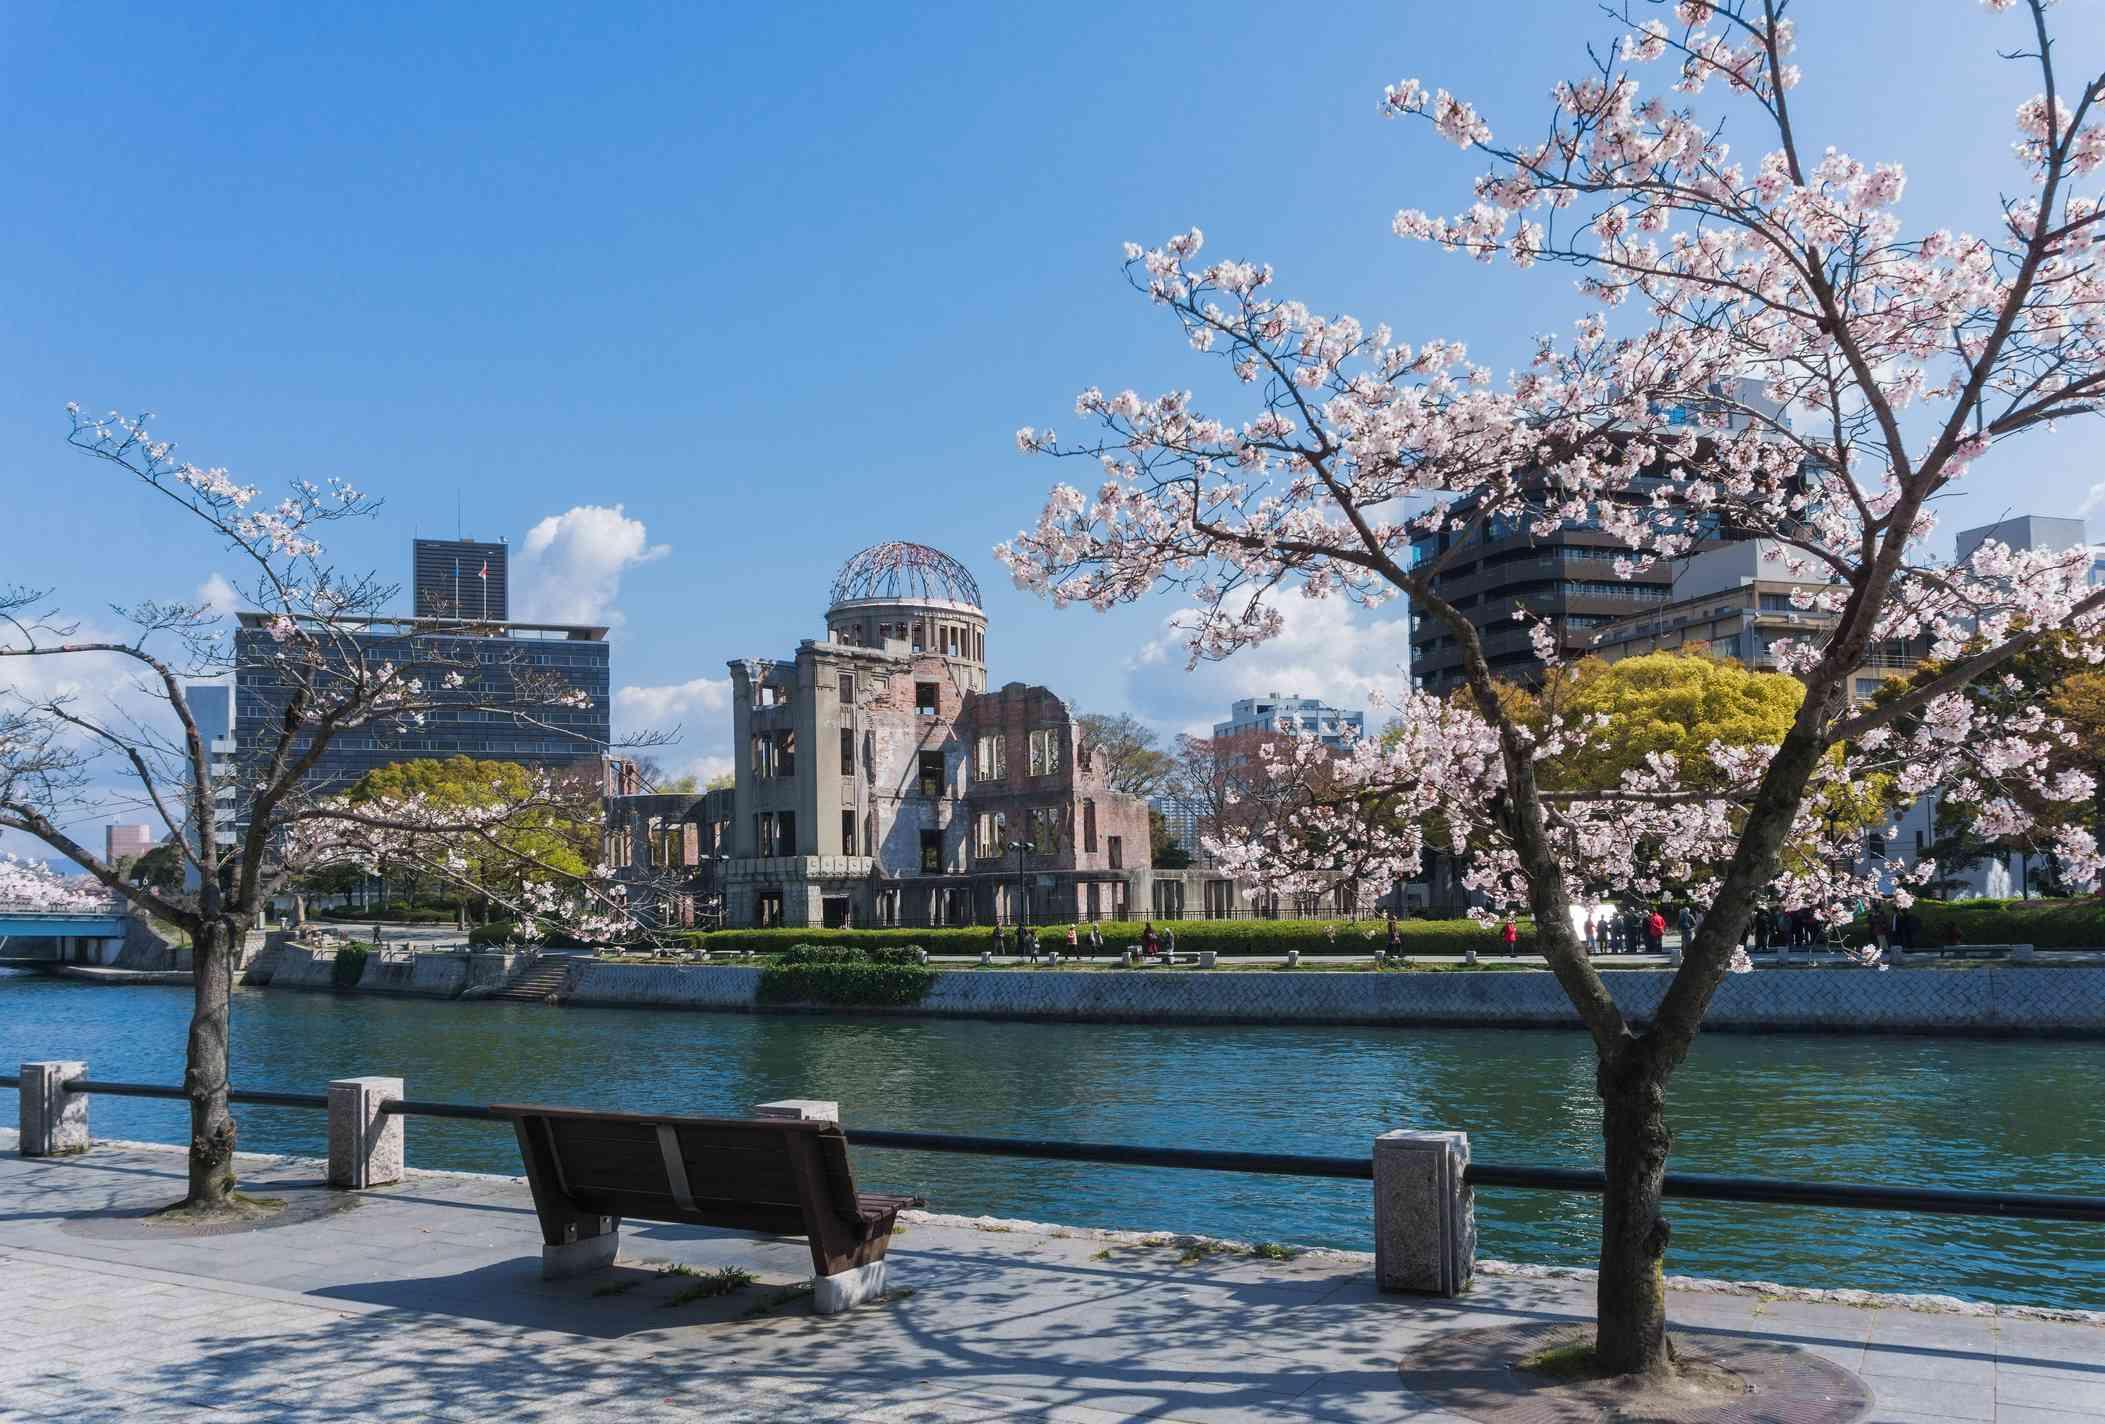 cherry blossom tree alongside a river